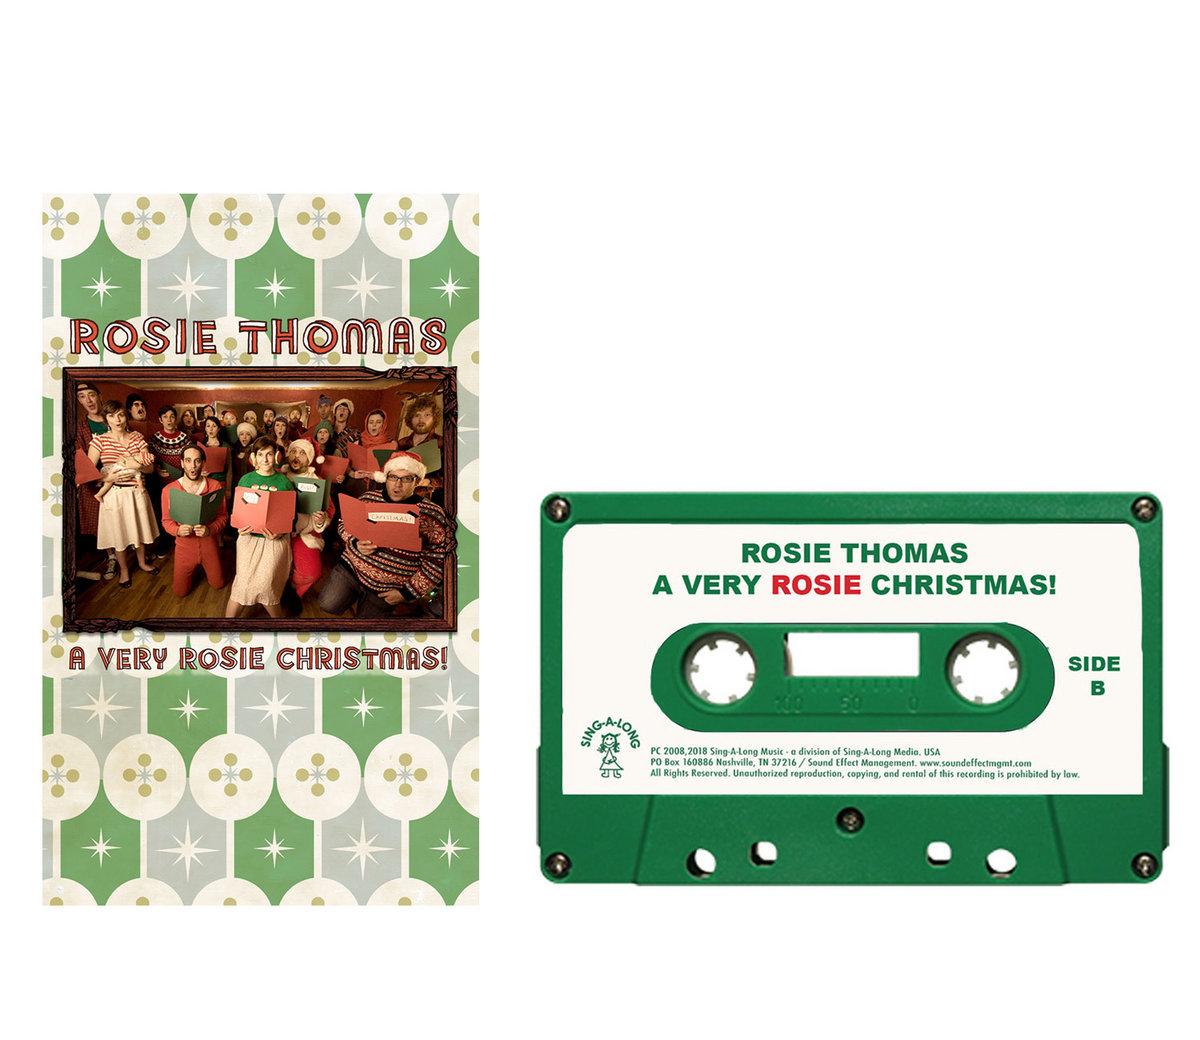 A VERY ROSIE CHRISTMAS! | Rosie Thomas